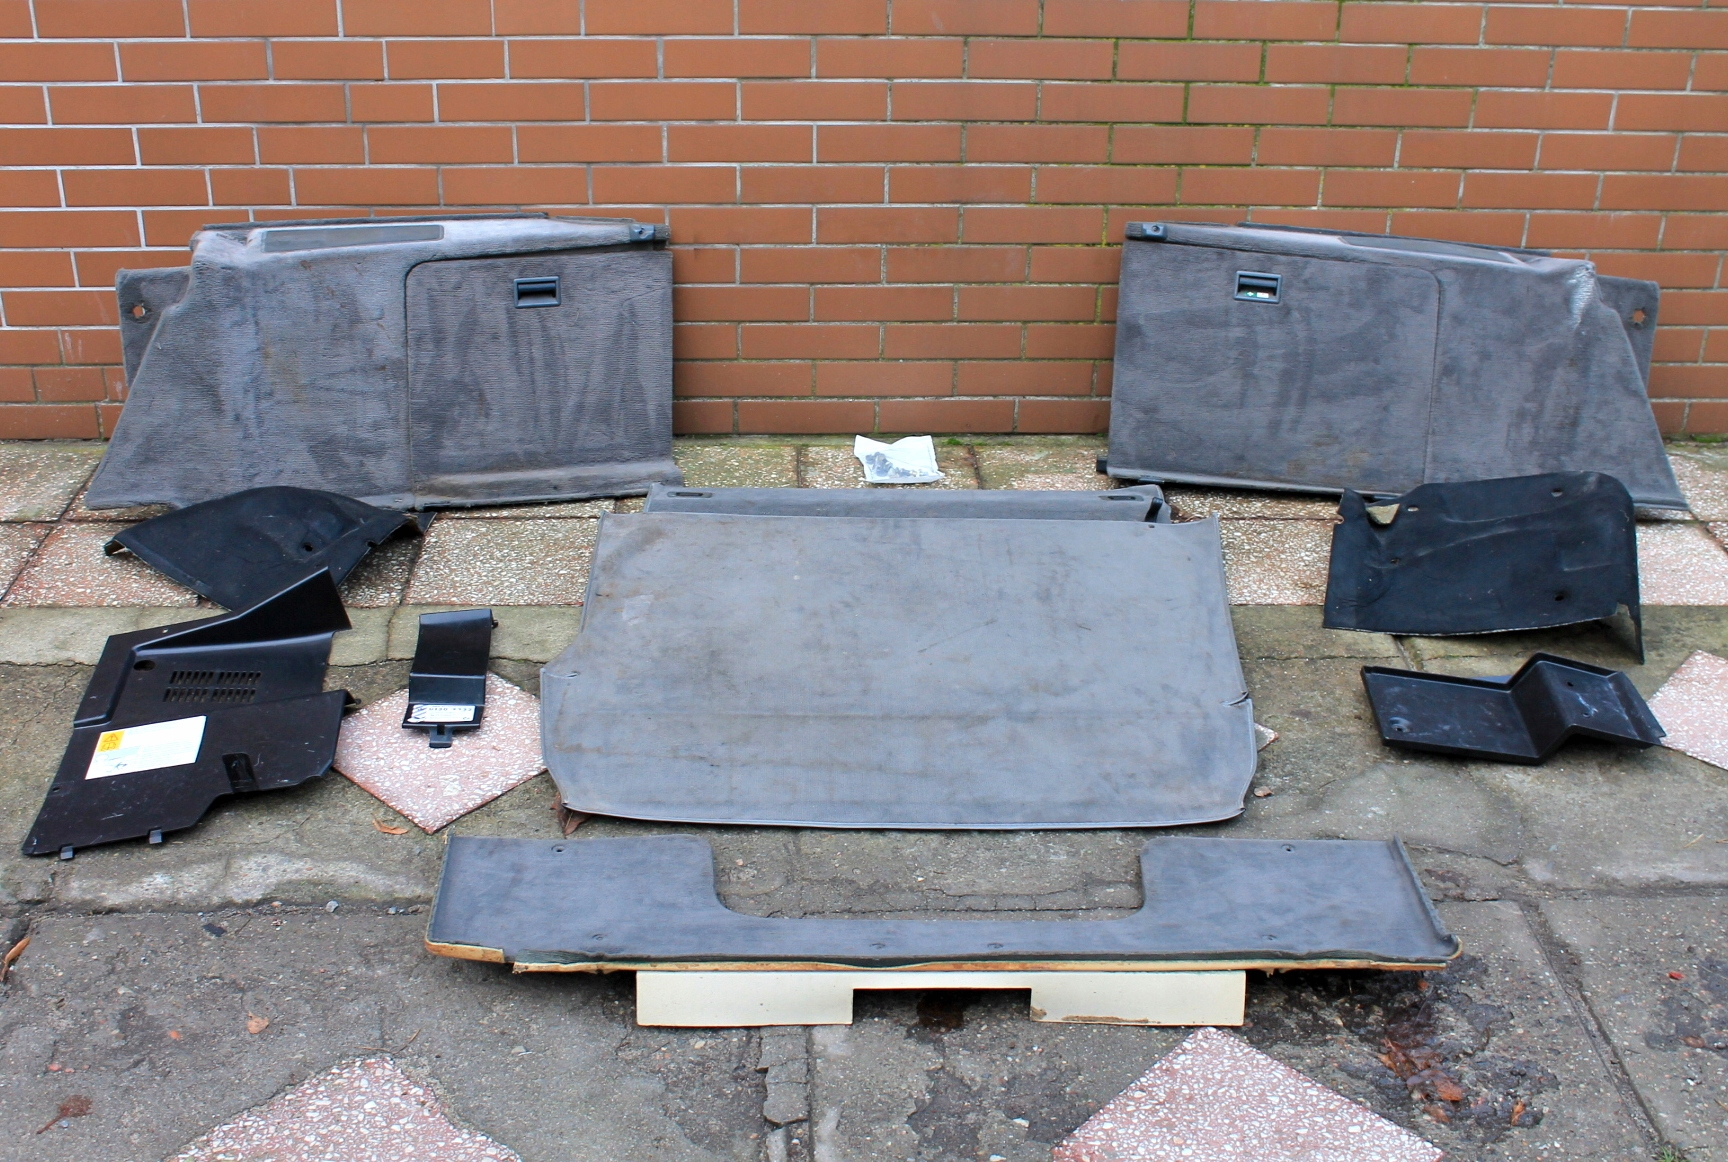 bmw e30 универсал - пол обивка багажник шторки